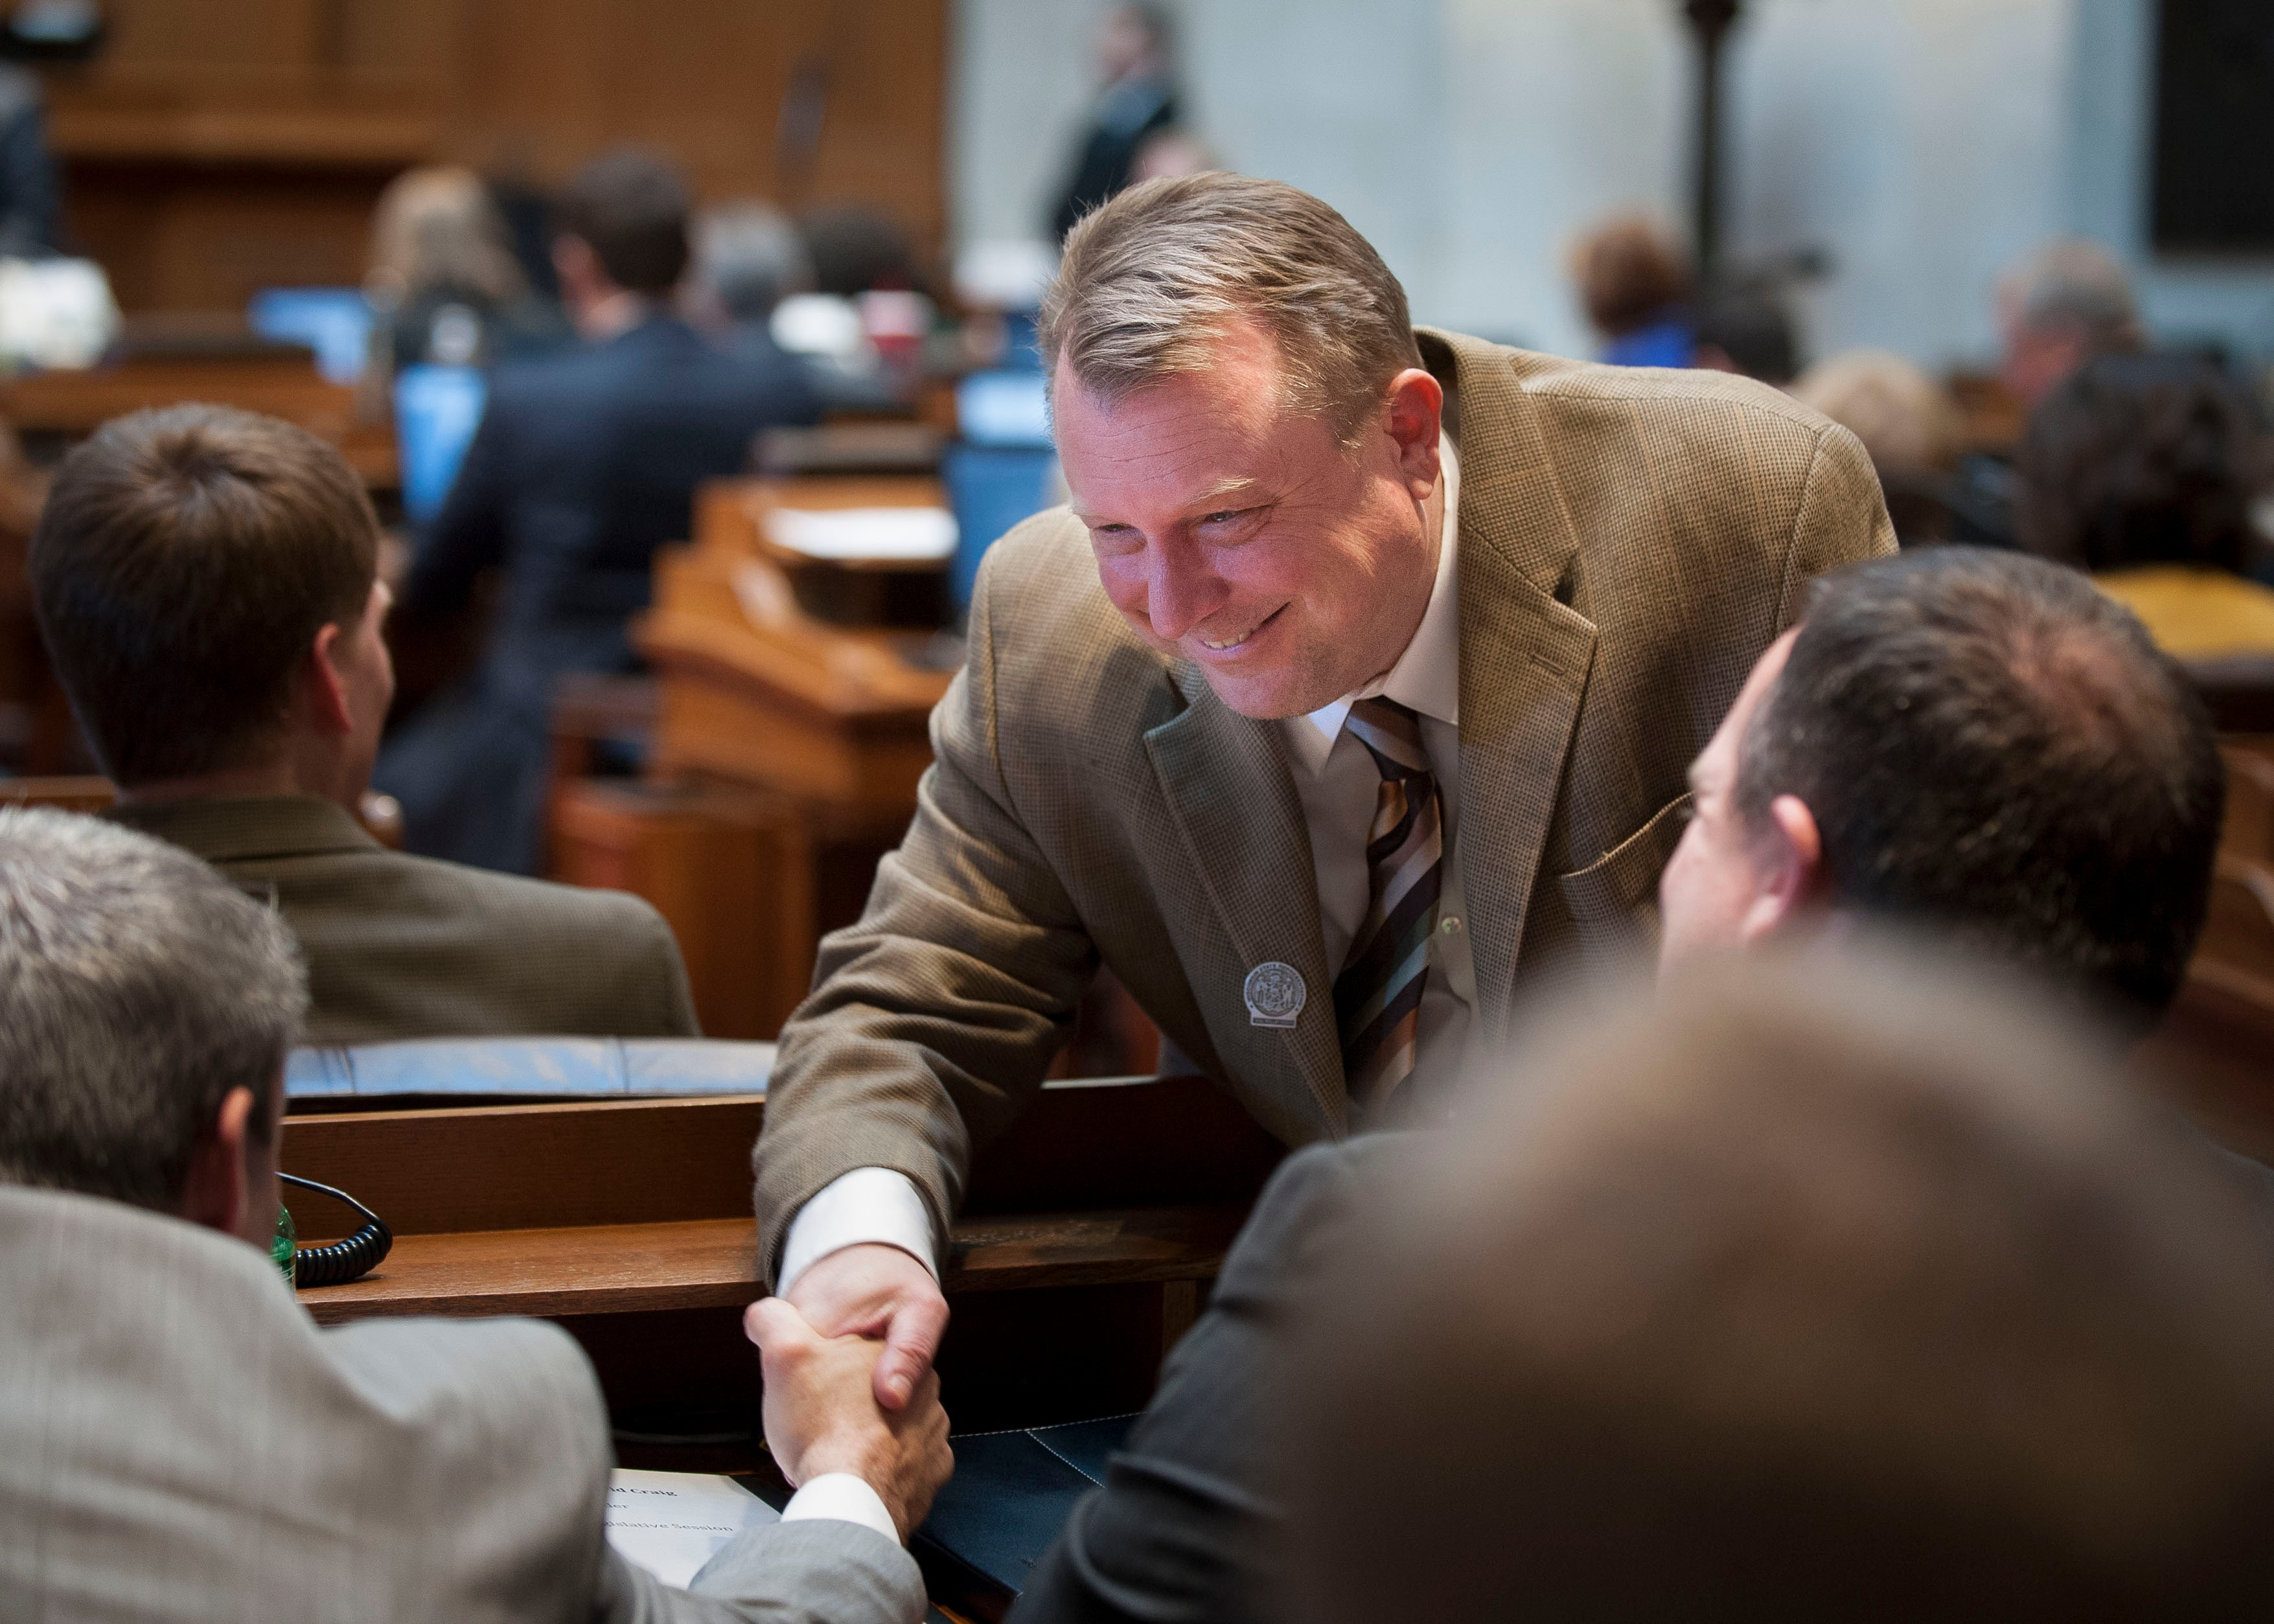 Rep. Josh Zepnick/Wisconsin State Assembly